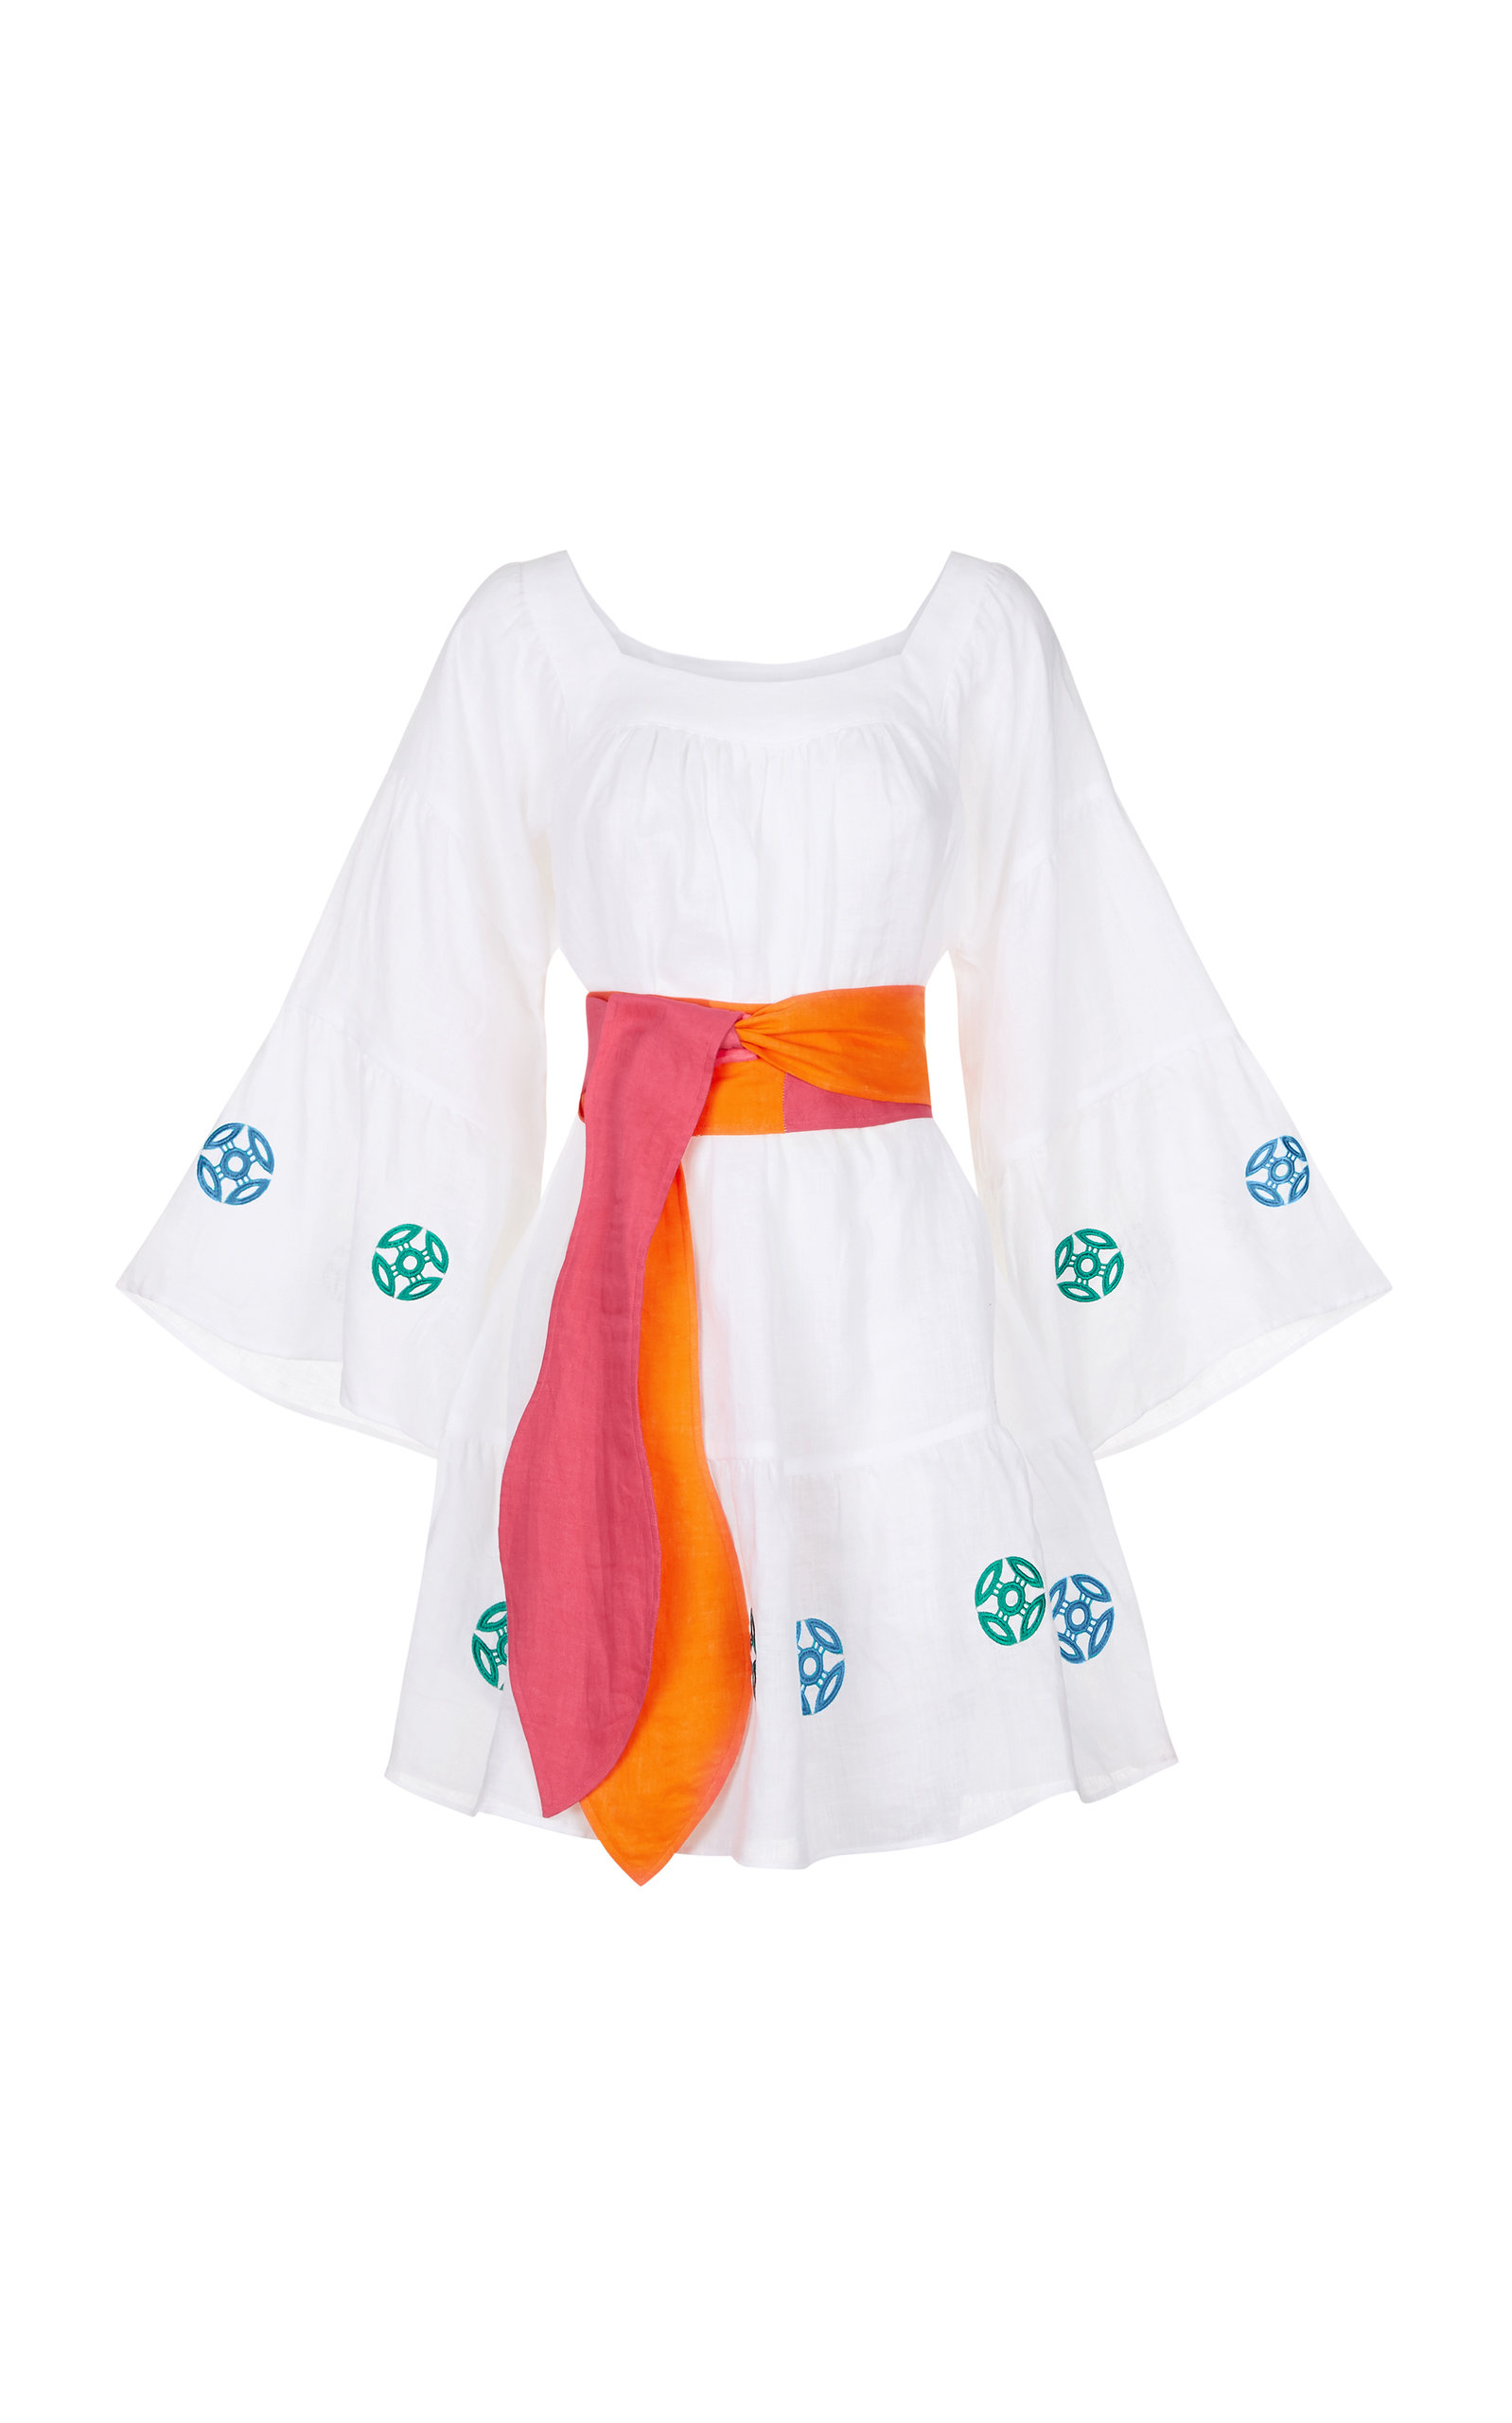 Buy Hester Bly Zadie Short Kaftan With Belt online, shop Hester Bly at the best price